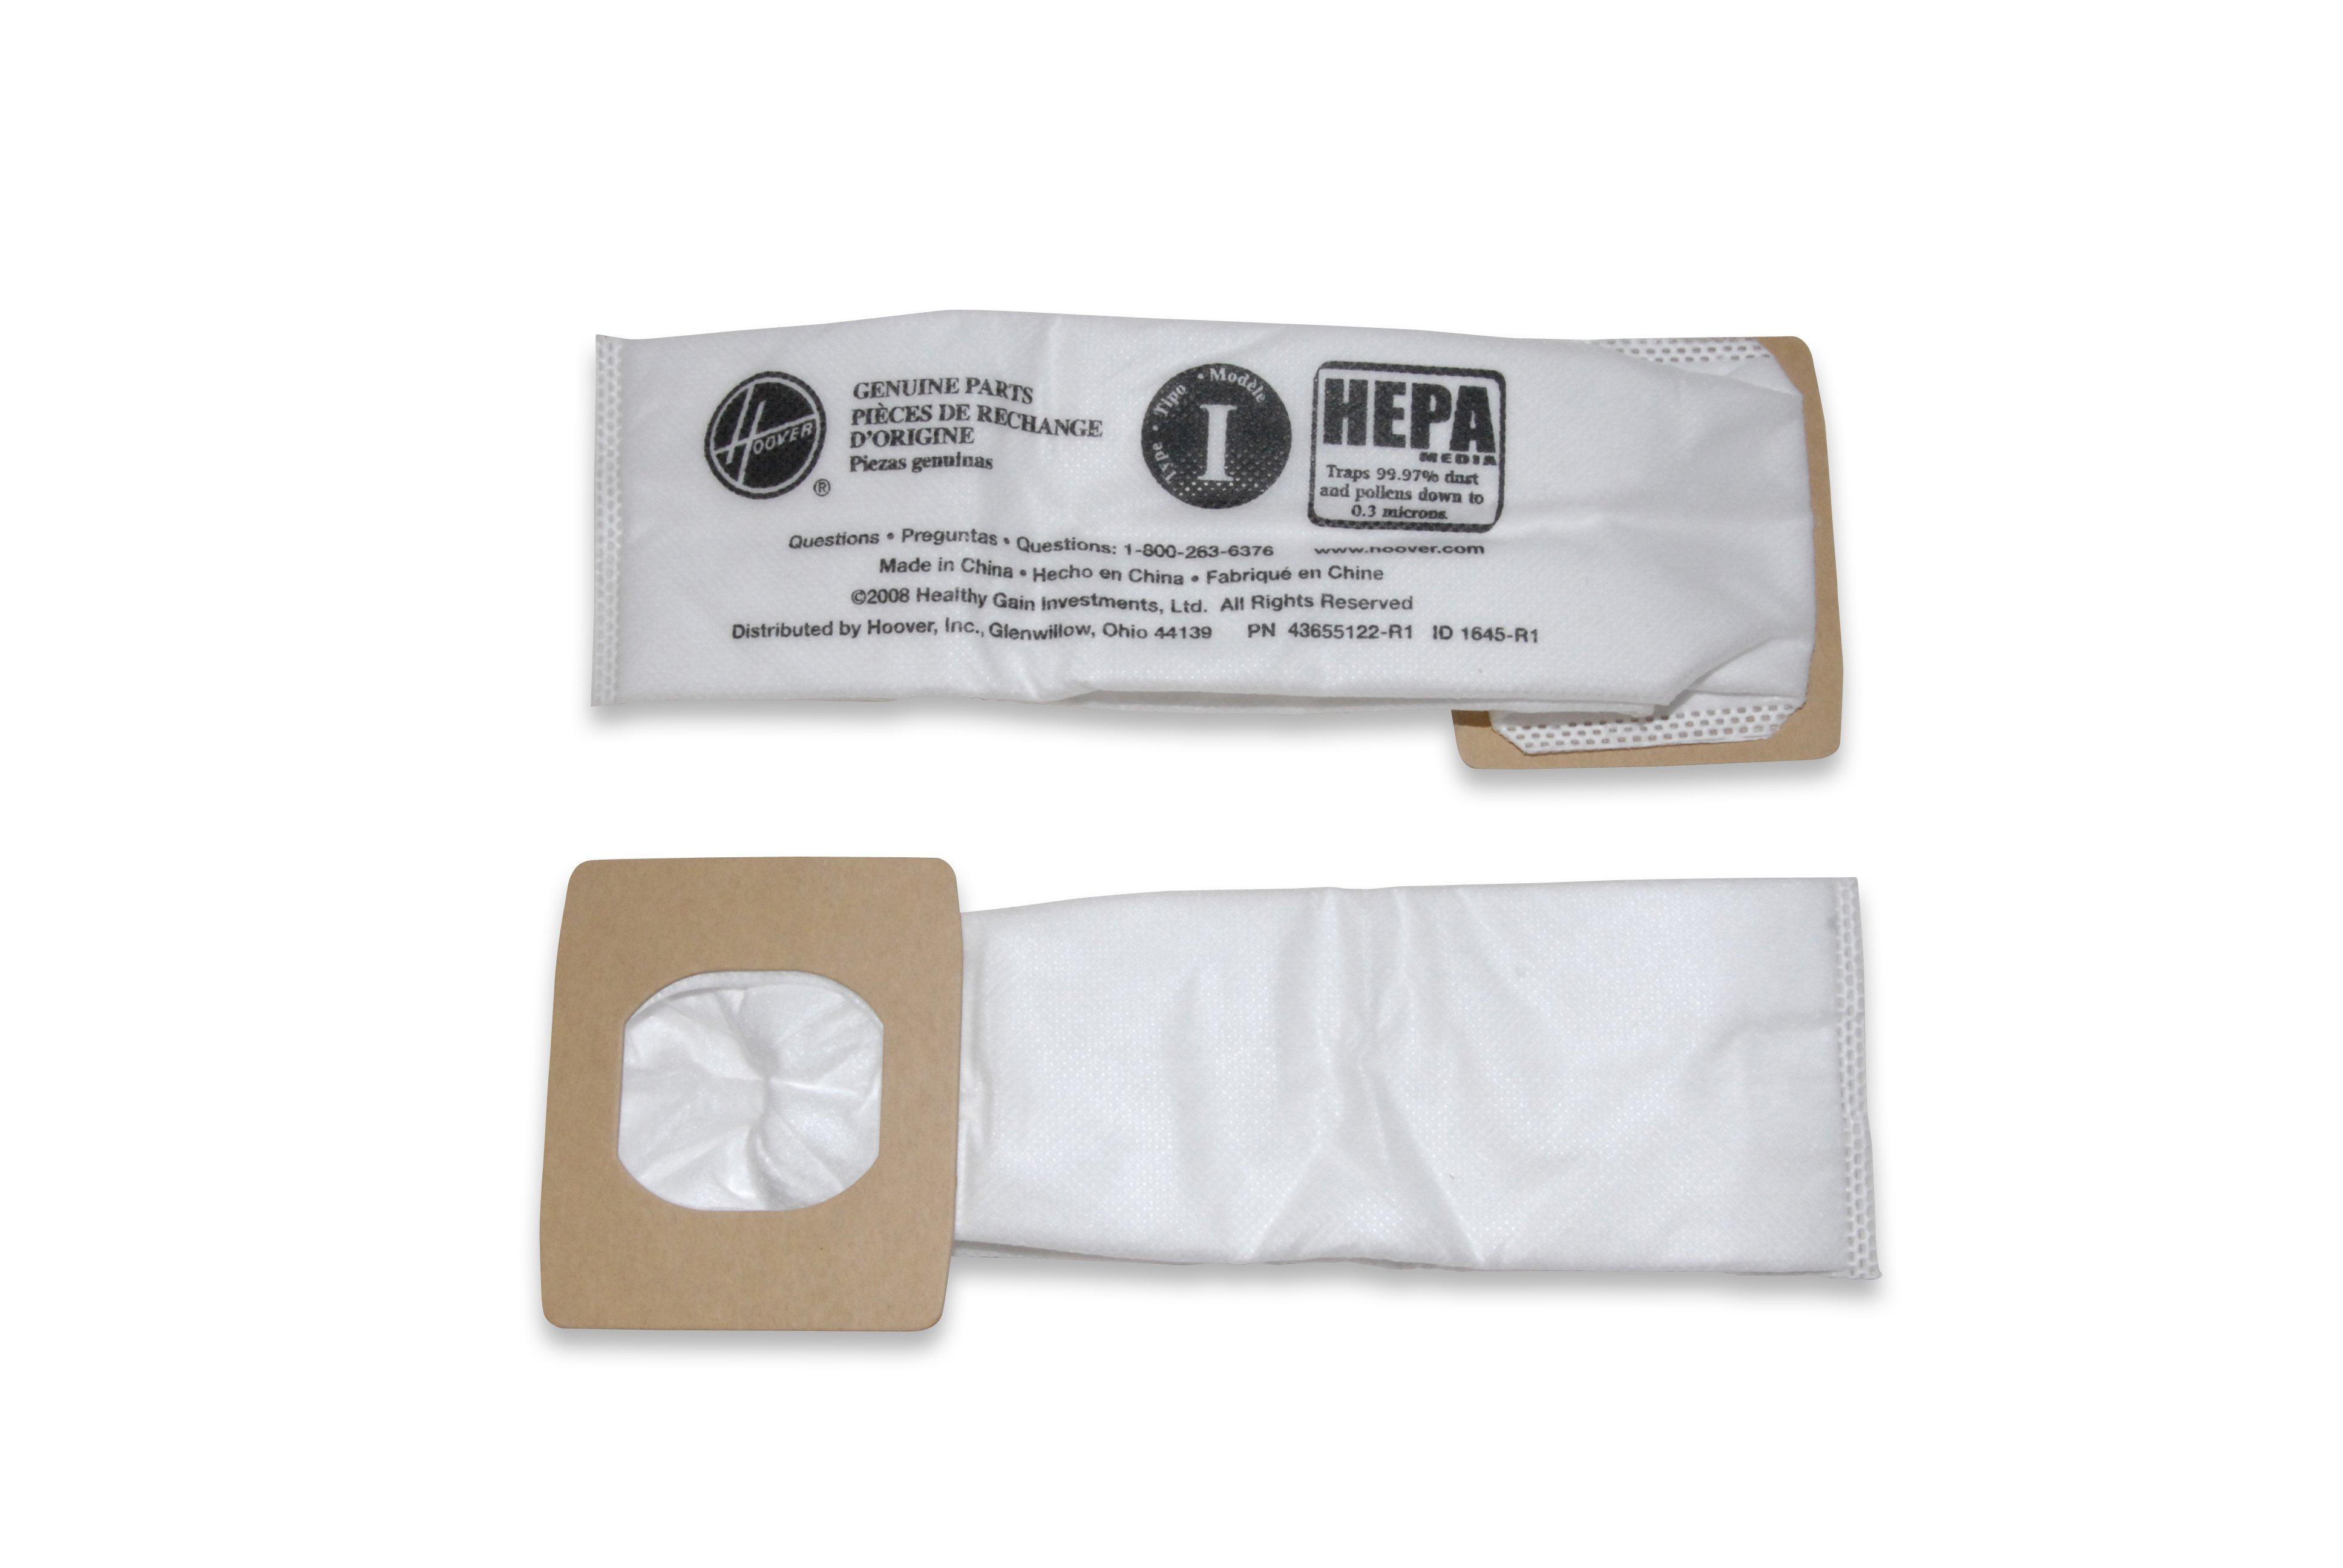 Type I HEPA Bag - 2 Pack4